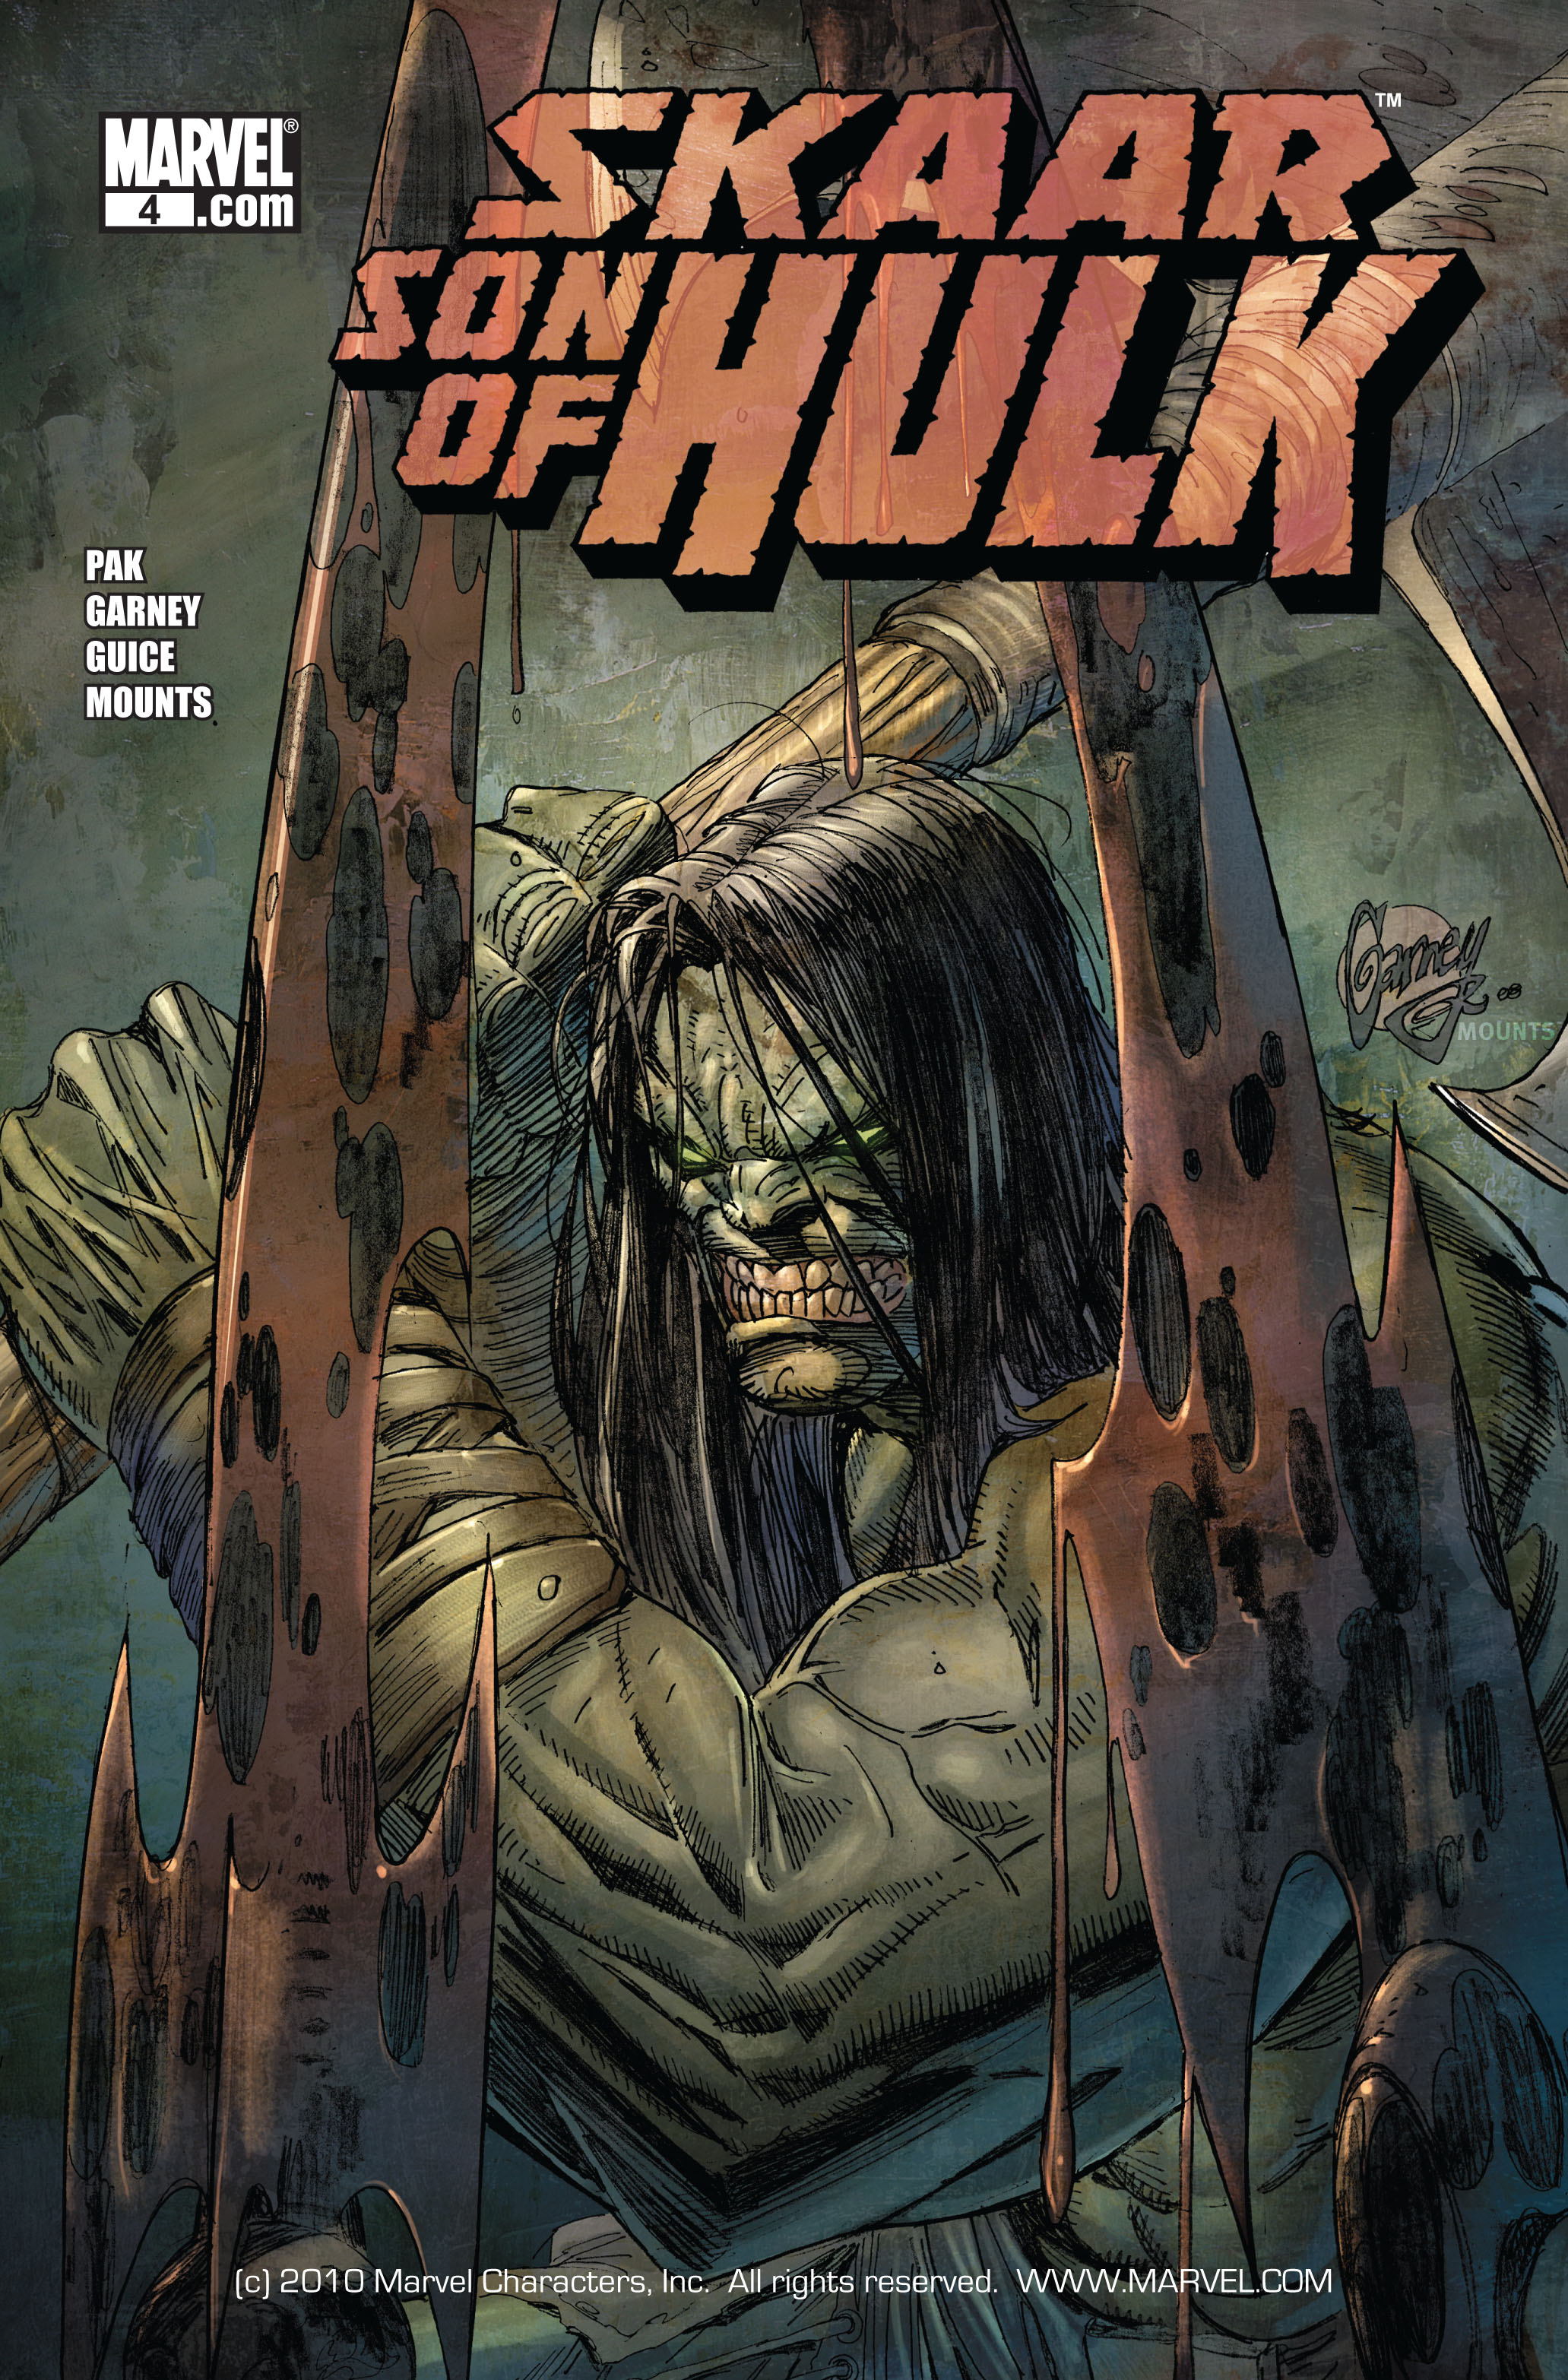 Read online Skaar: Son of Hulk comic -  Issue #4 - 1